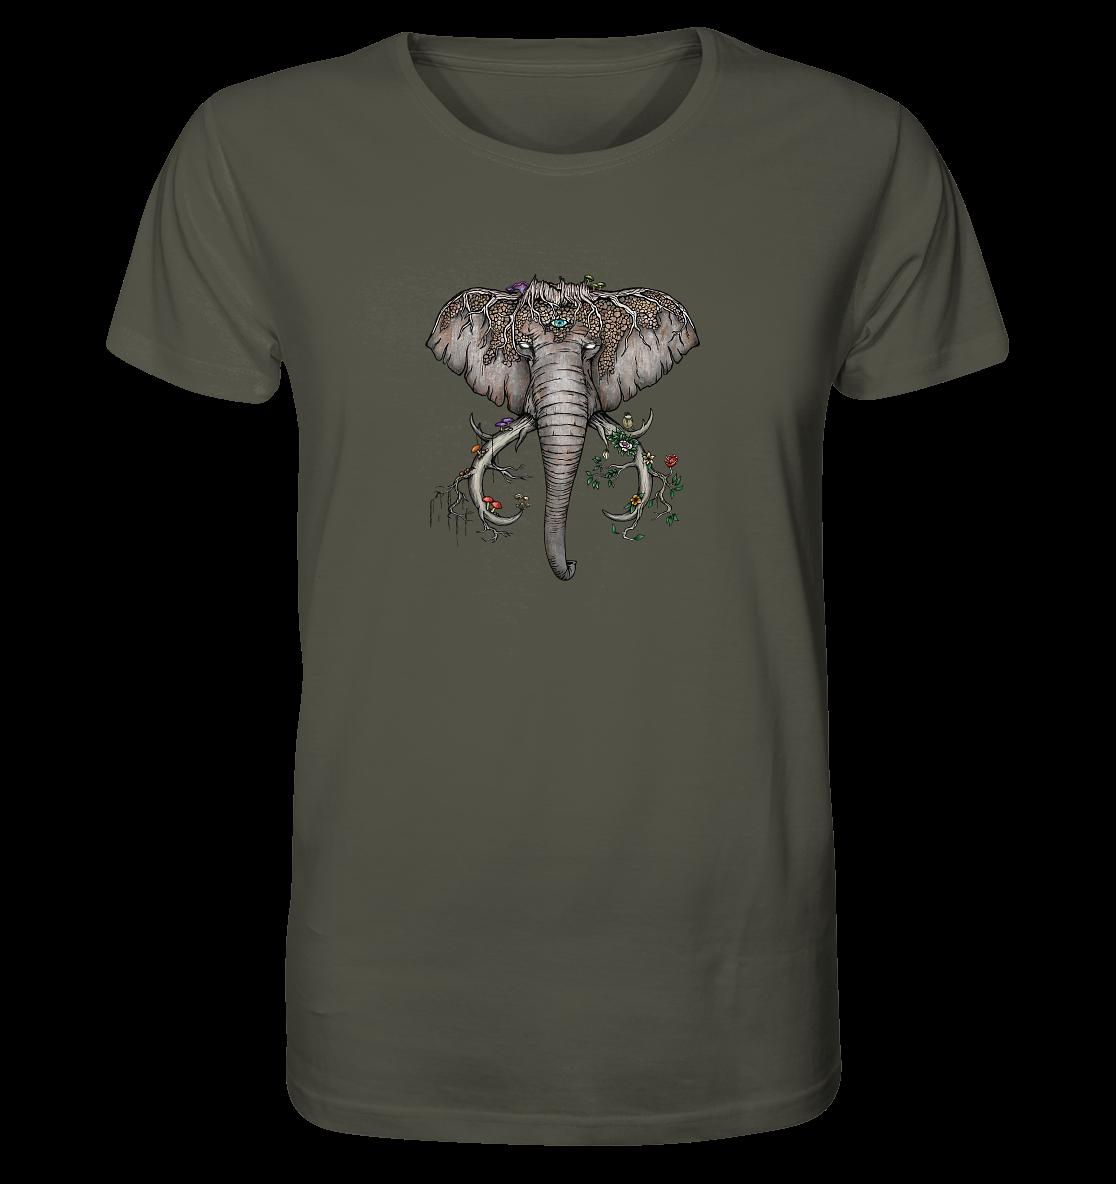 front-organic-shirt-545348-1116x-1.png